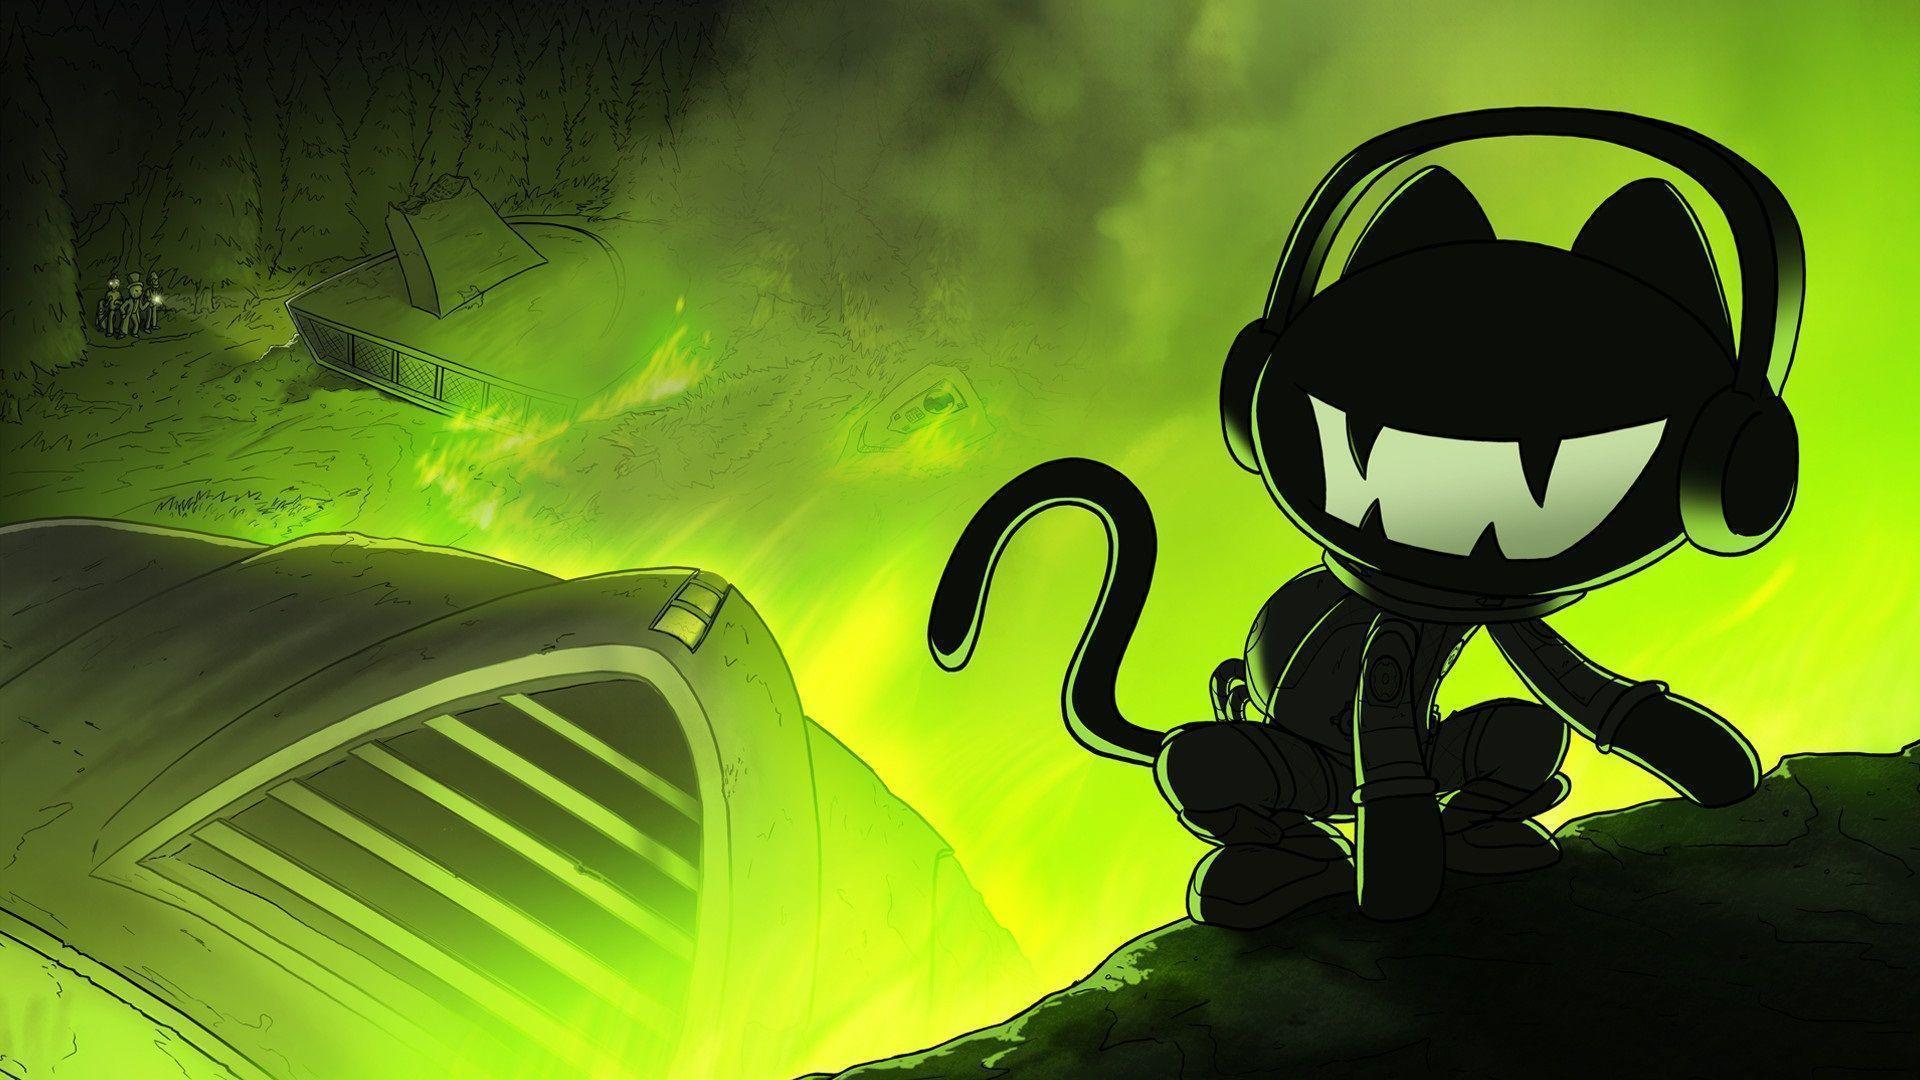 Monstercat Wallpapers - Wallpaper Cave